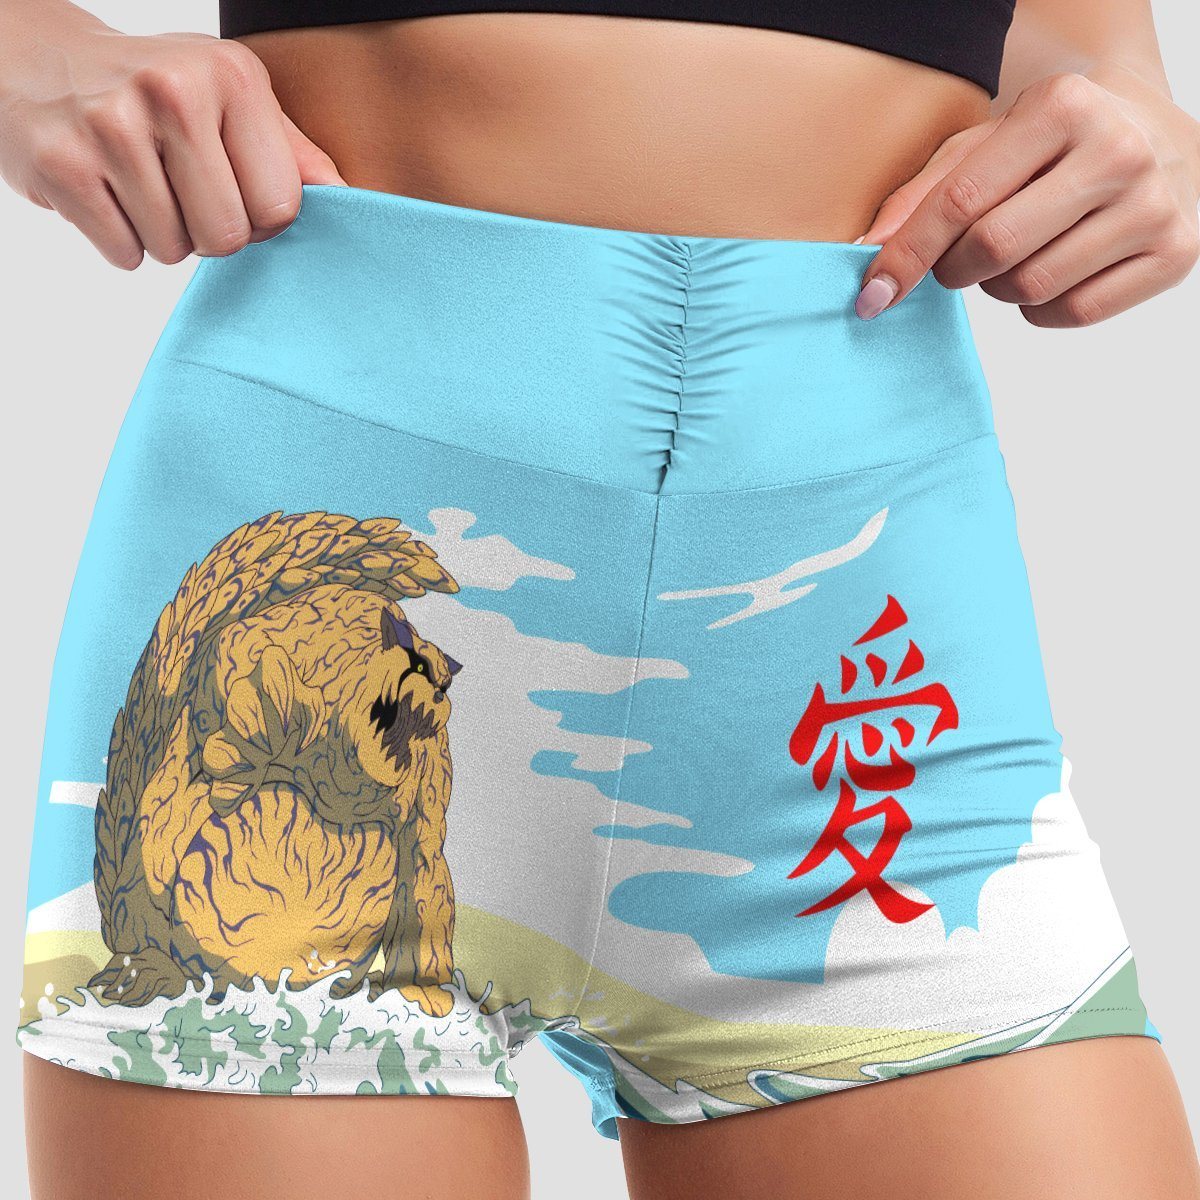 gaara summer active wear set 864024 - Anime Swimsuits